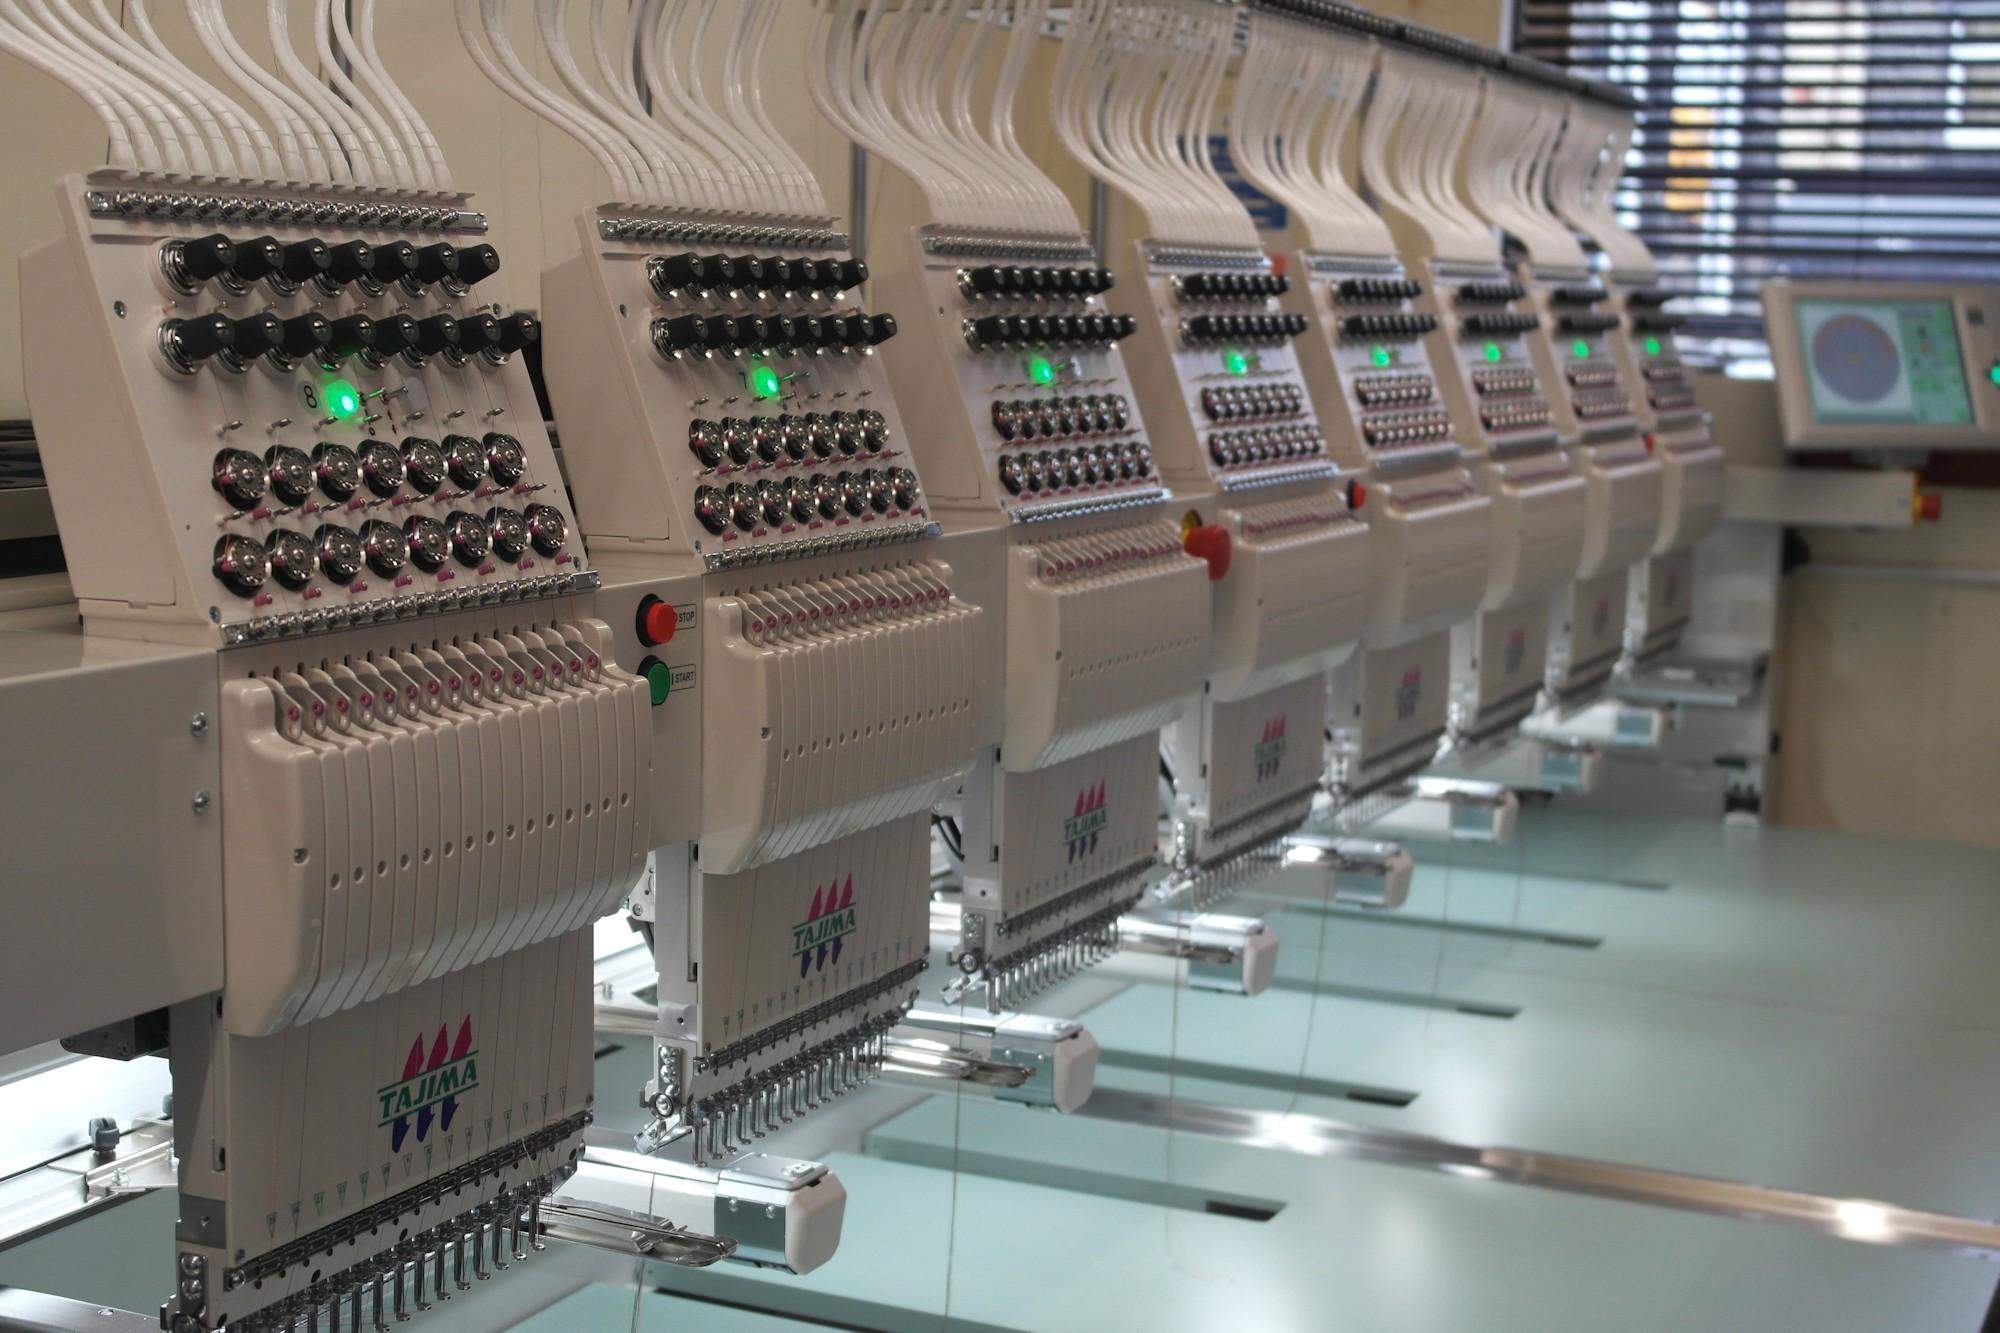 jaybee-embroidery-machines